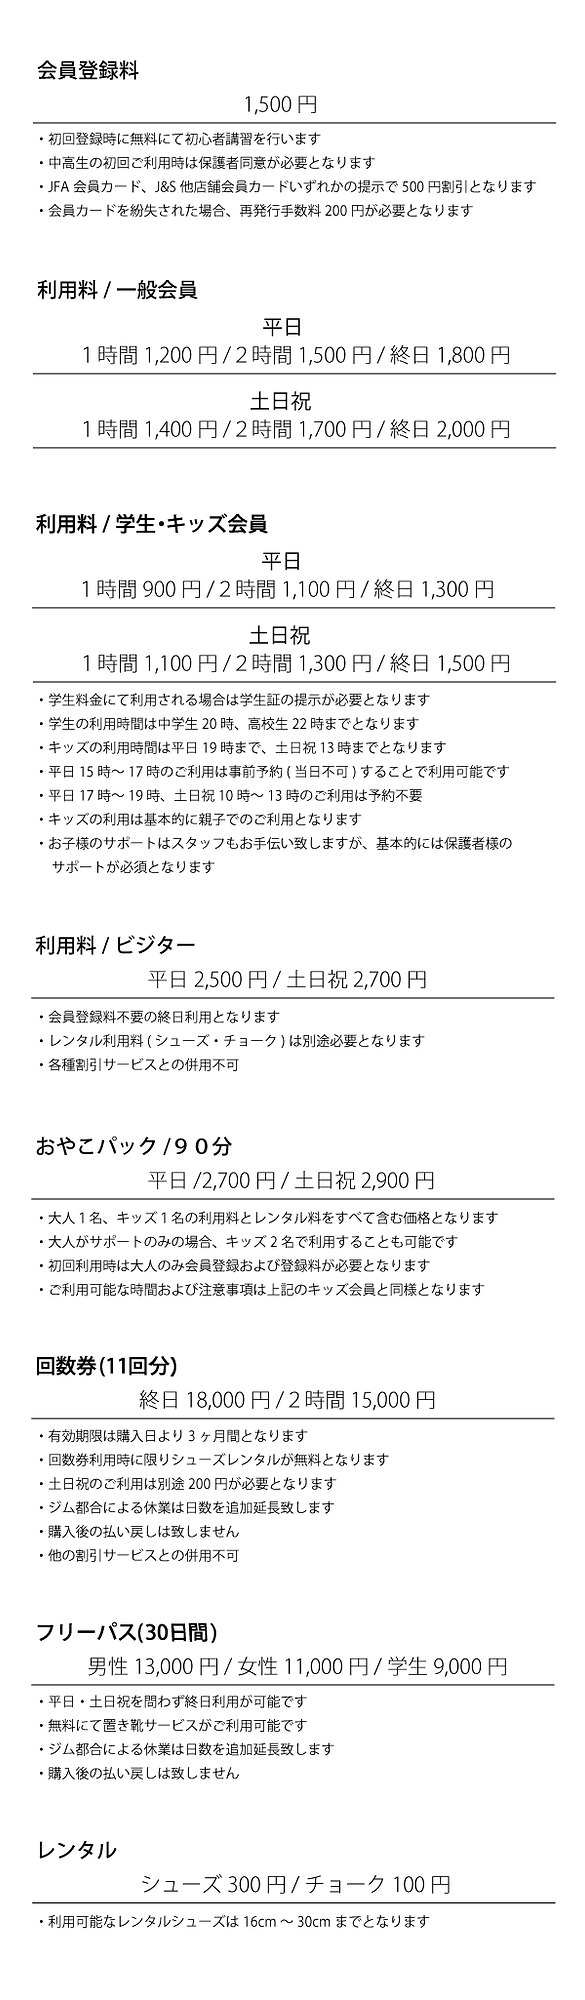 HP用料金表202104.png